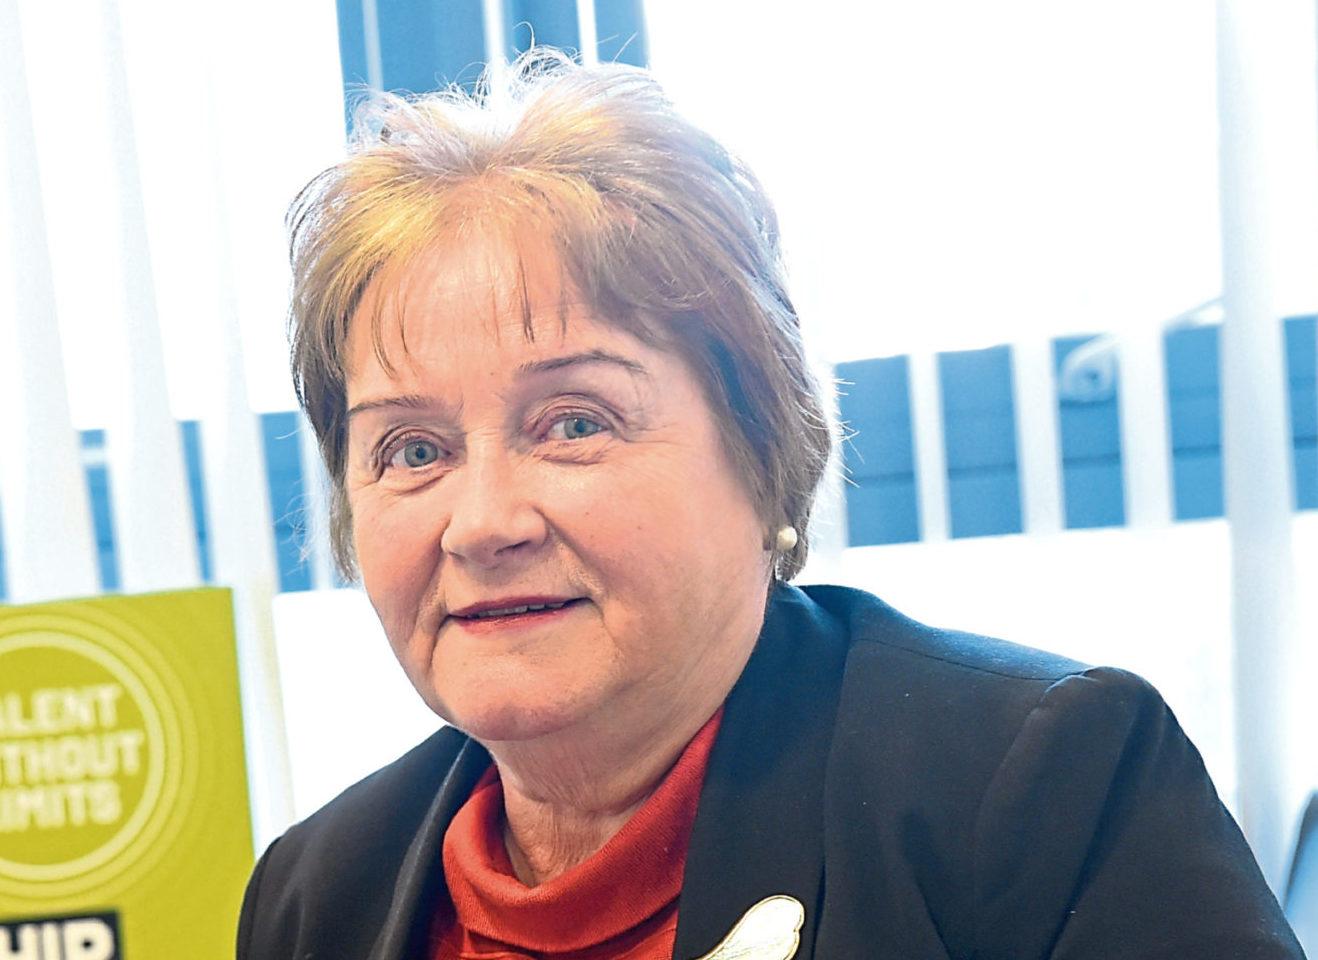 Maureen Watt praised efforts to keep ethnic minorities informed about public health information